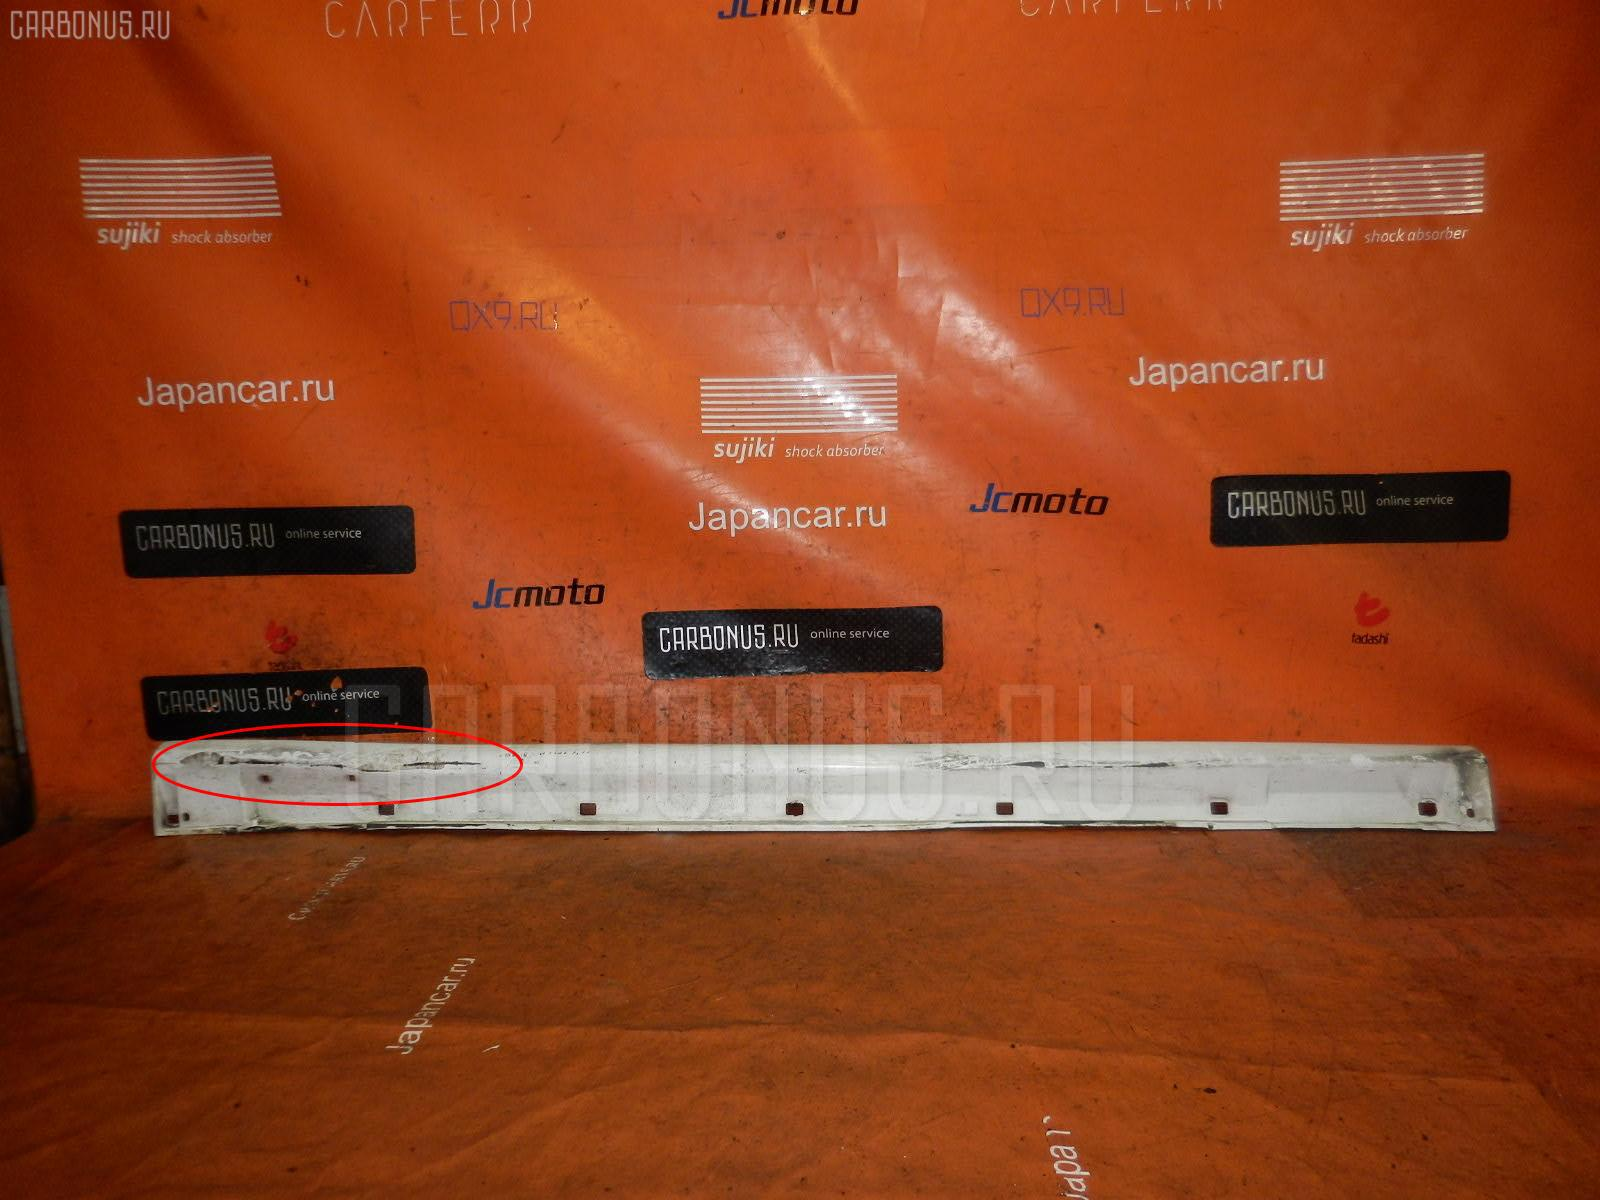 Порог кузова пластиковый ( обвес ) SUBARU LEGACY WAGON BH9 Фото 2